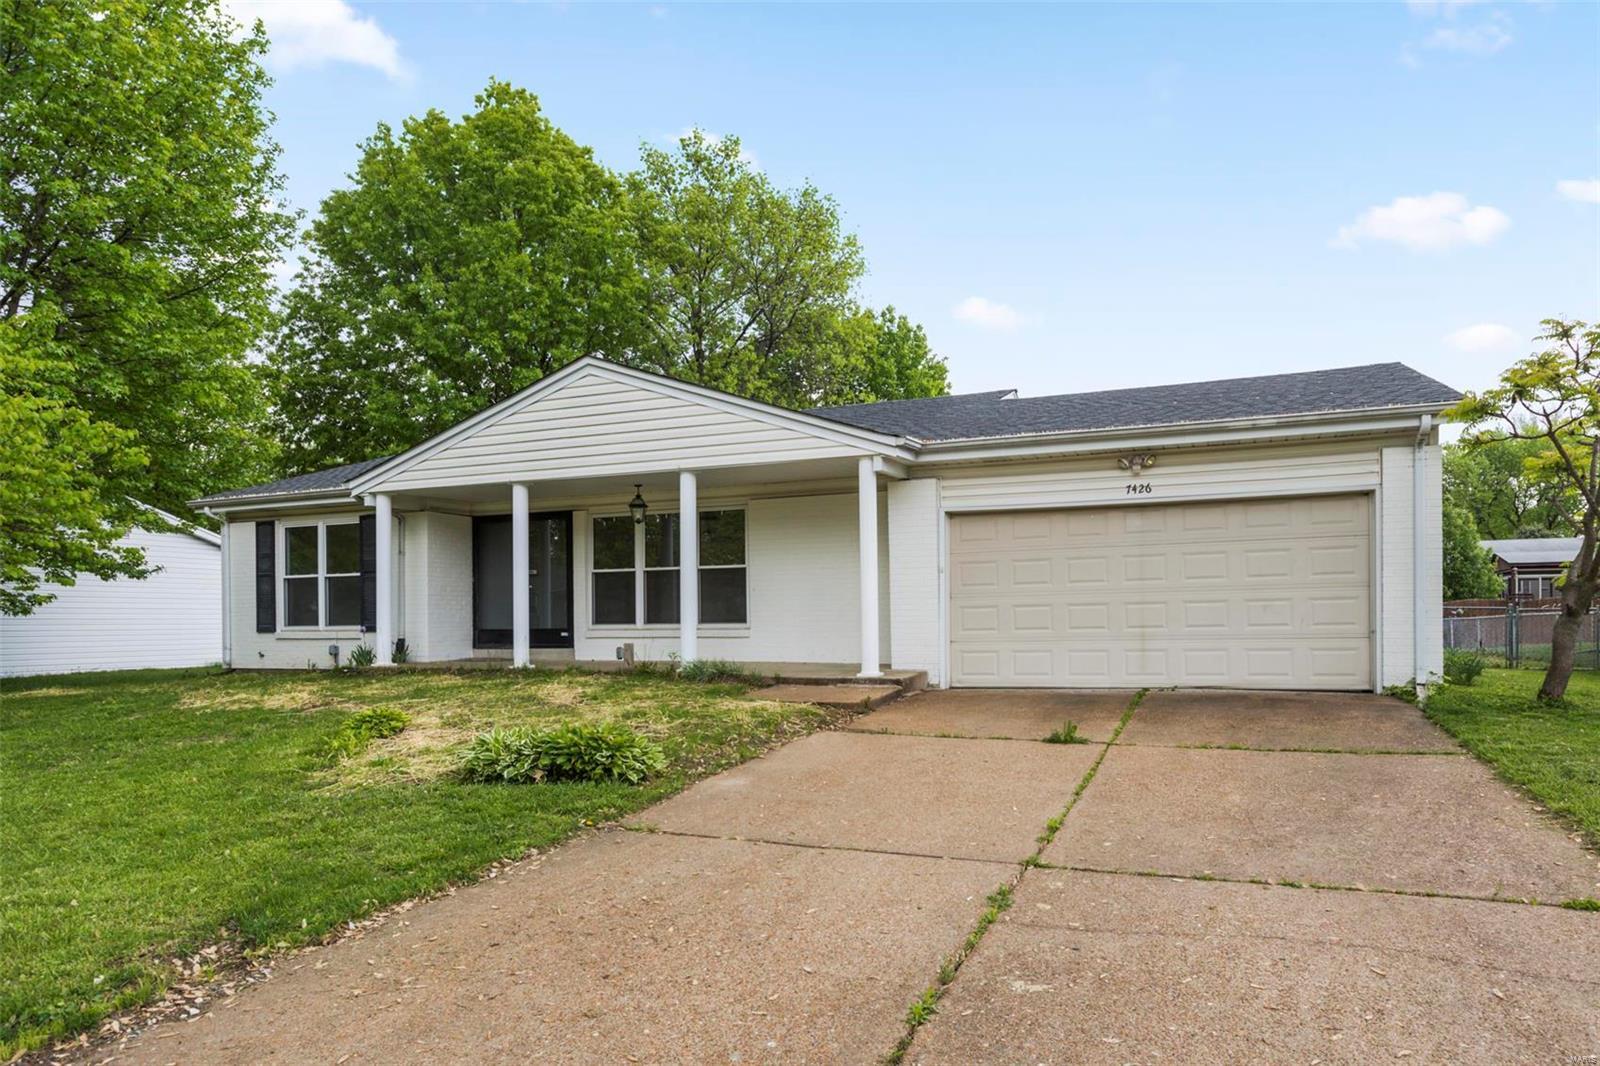 7426 Foxtrot Property Photo - Hazelwood, MO real estate listing